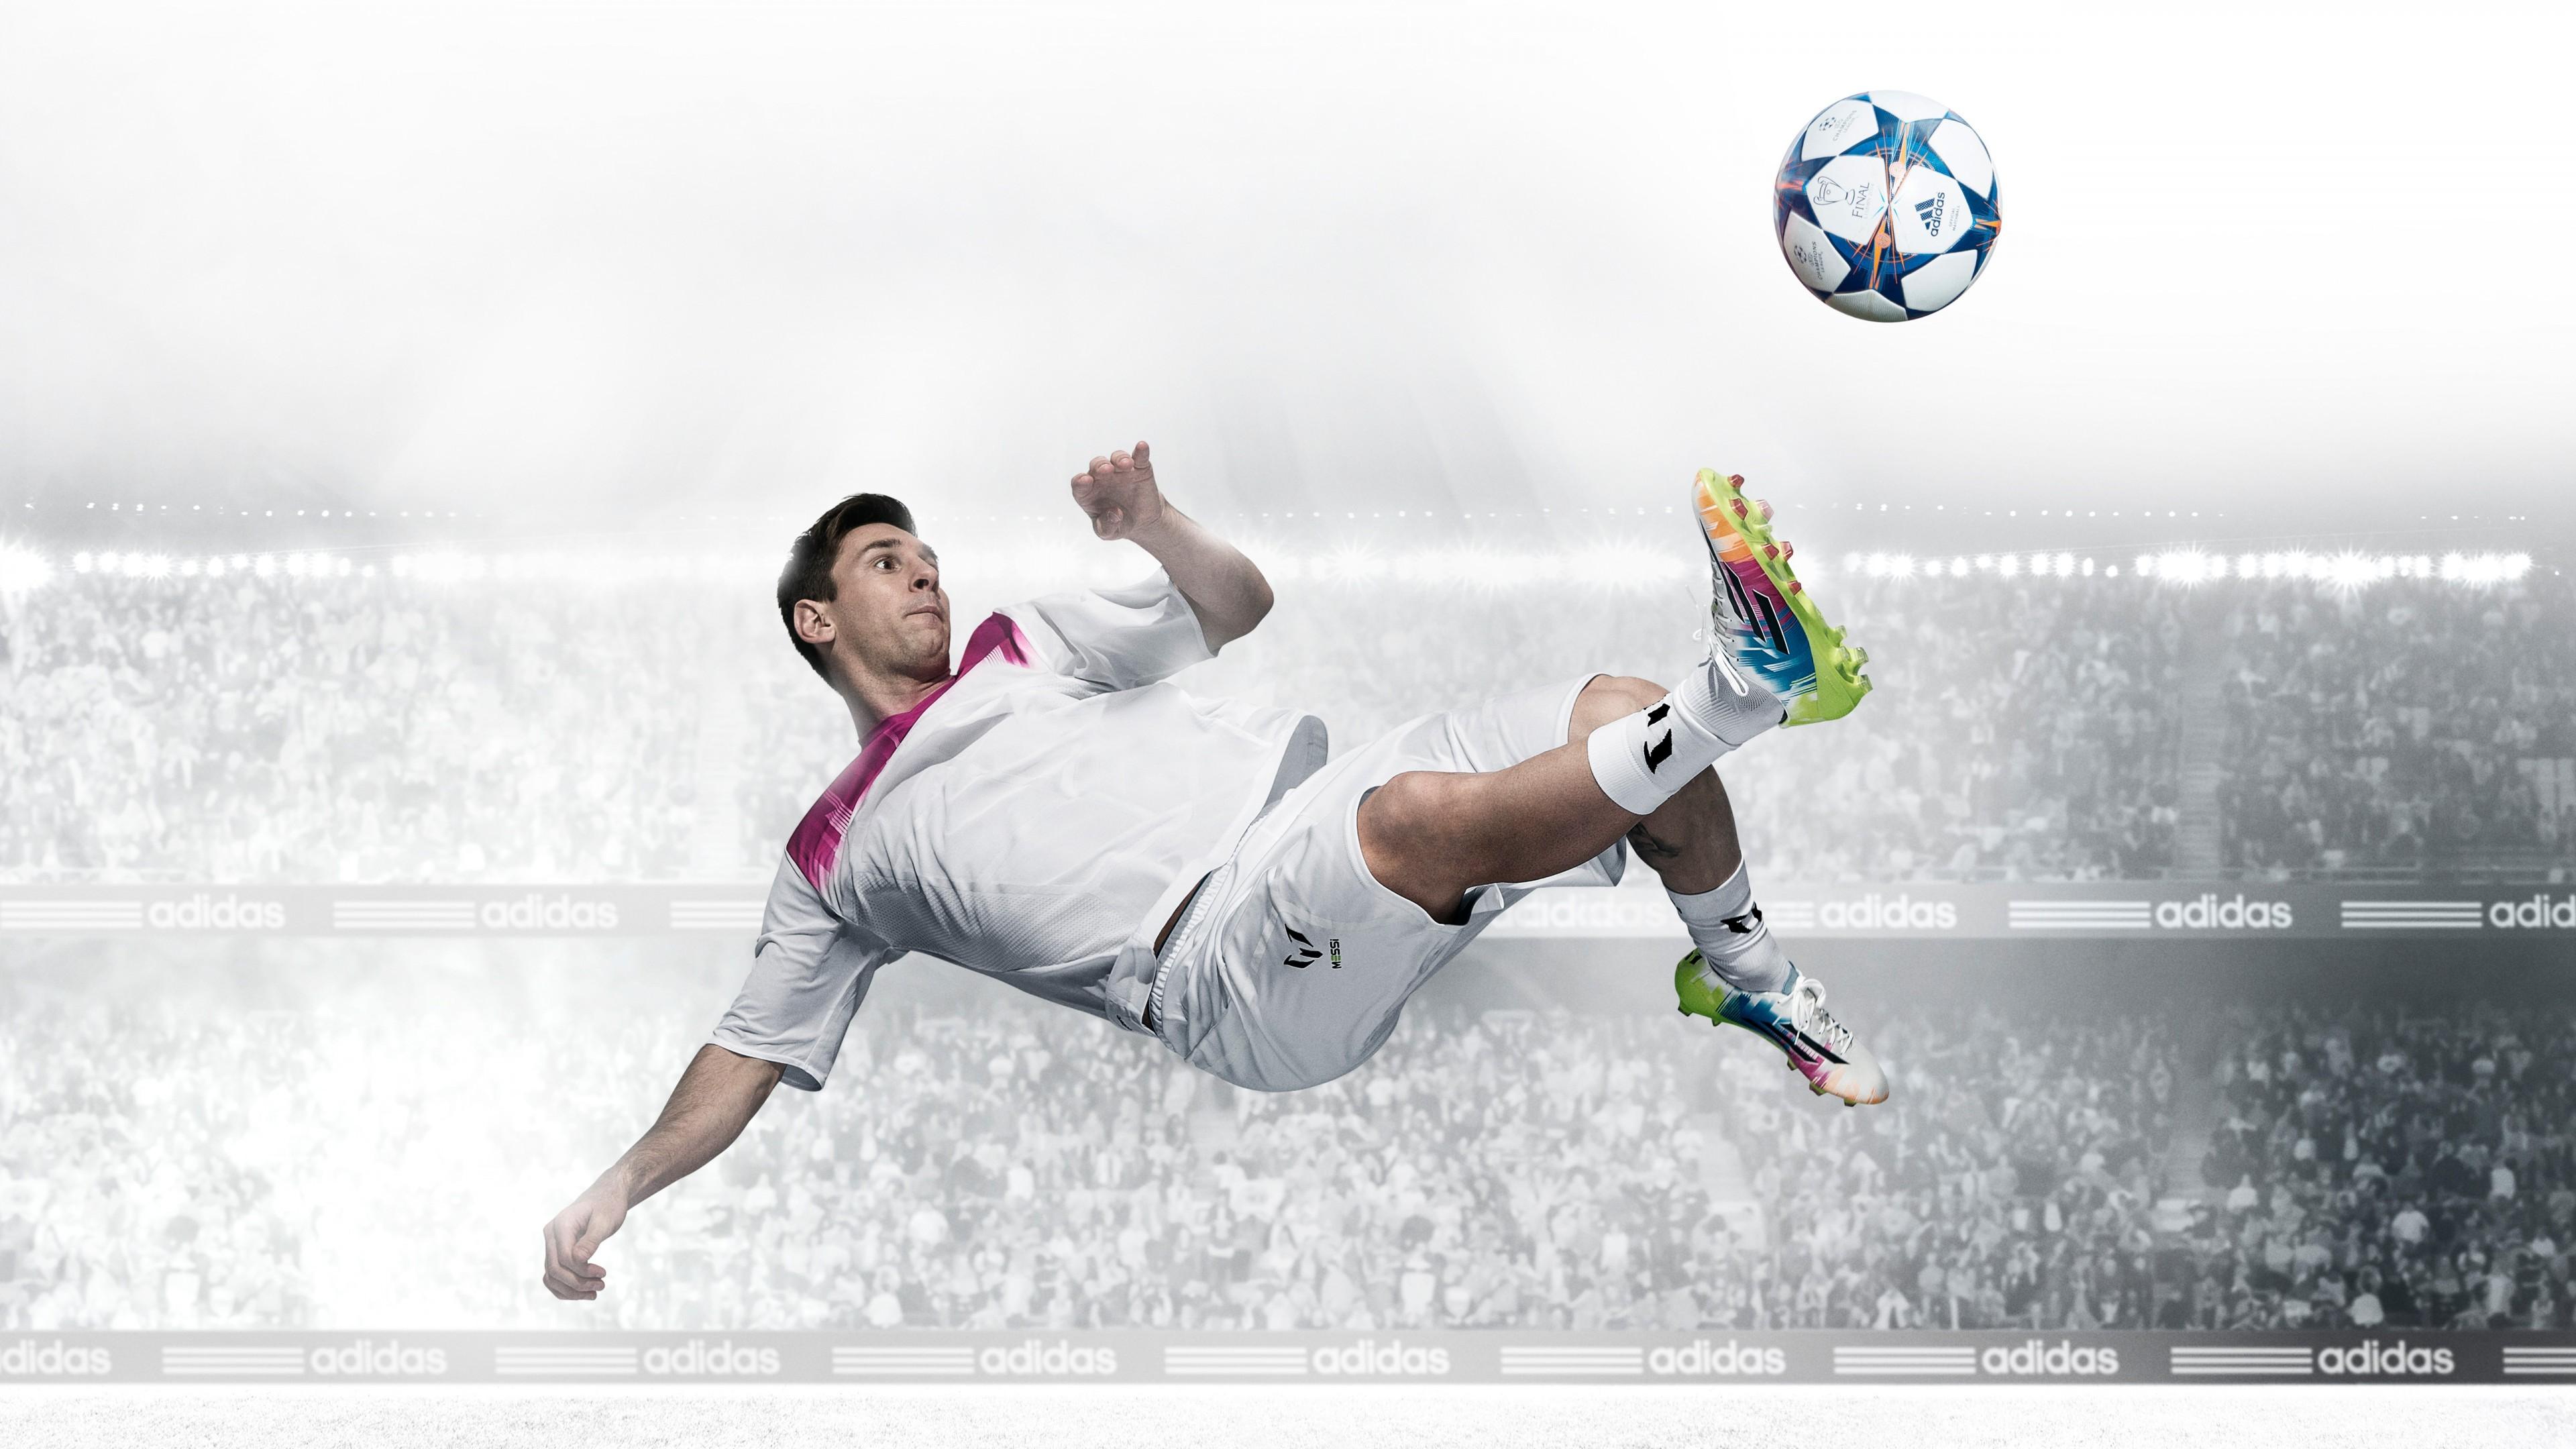 Messi Soccer Football HD Wallpaper